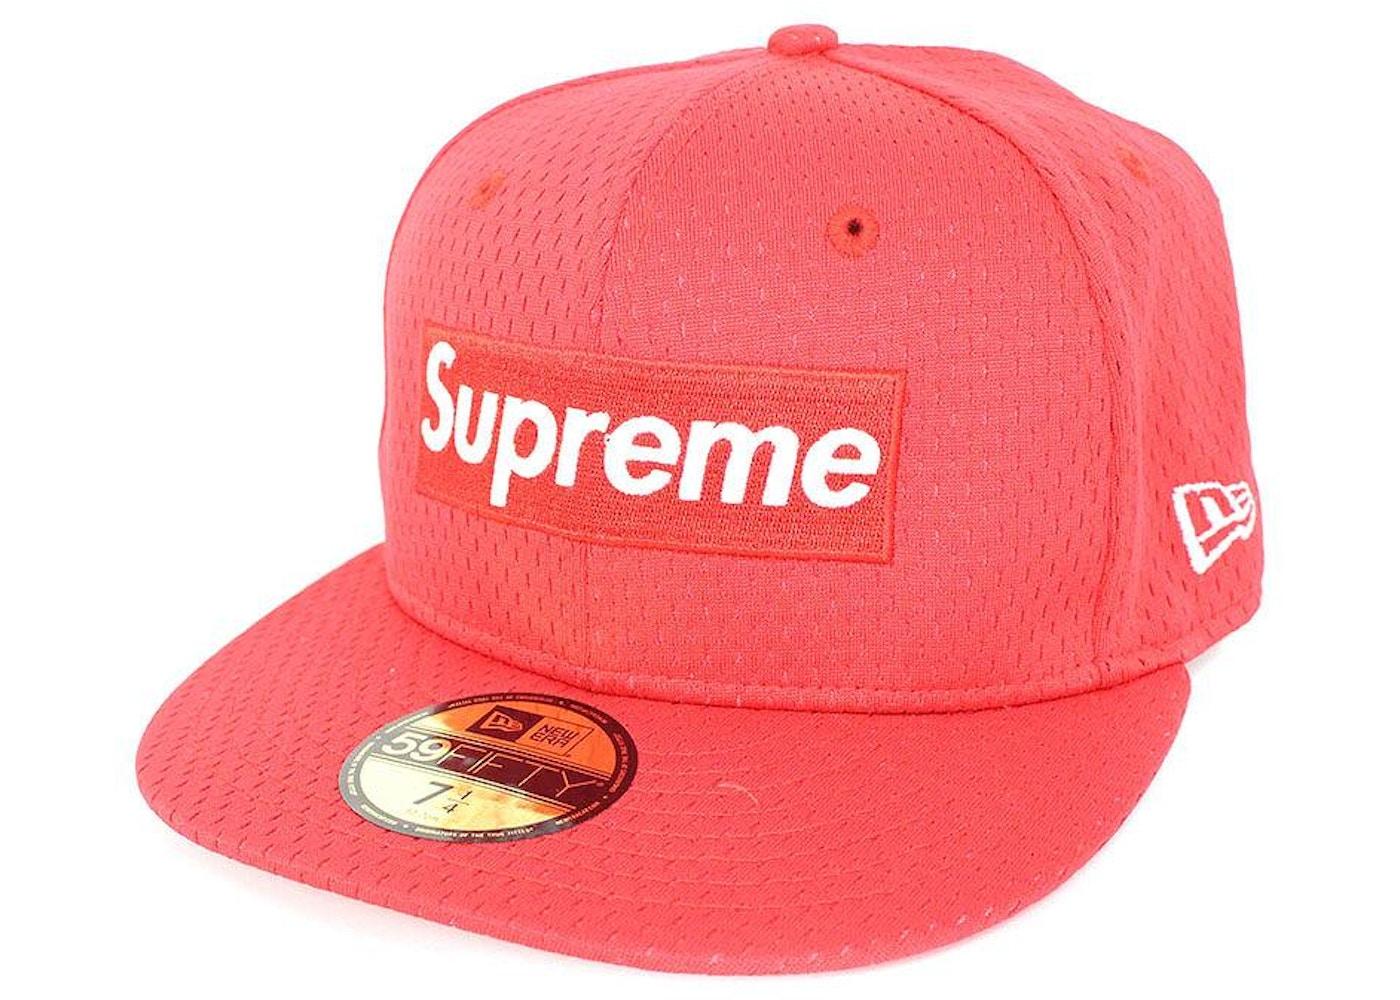 25430d95f95 Buy   Sell Streetwear - Highest Bid